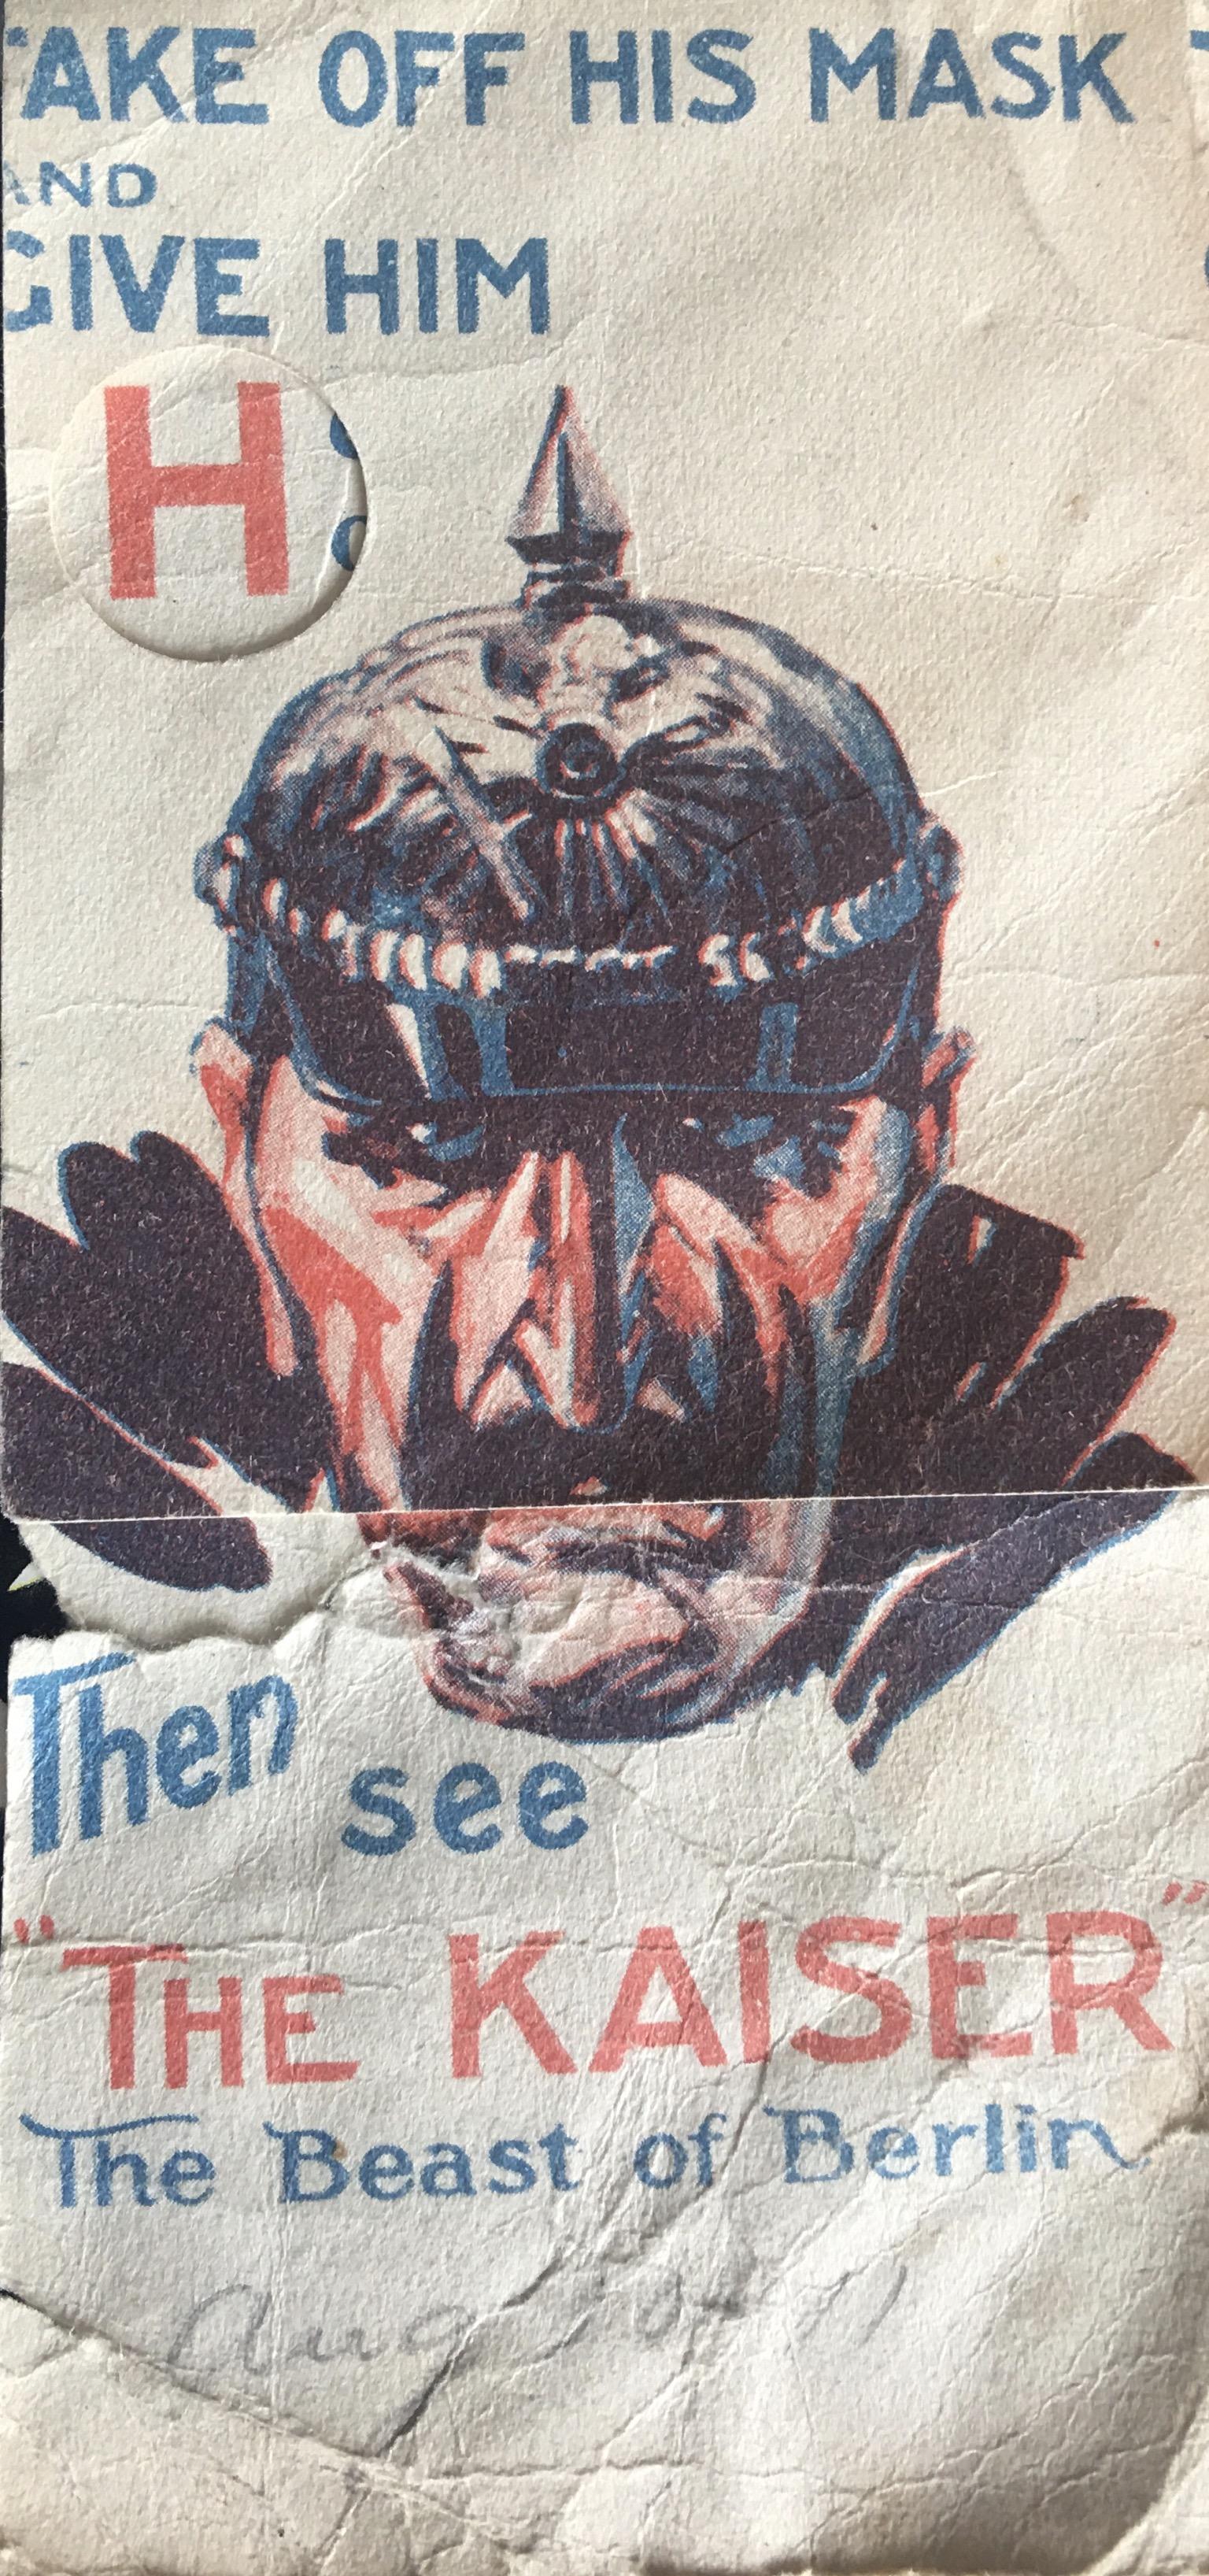 The Kaiser, the Beast of Berlin (1918)